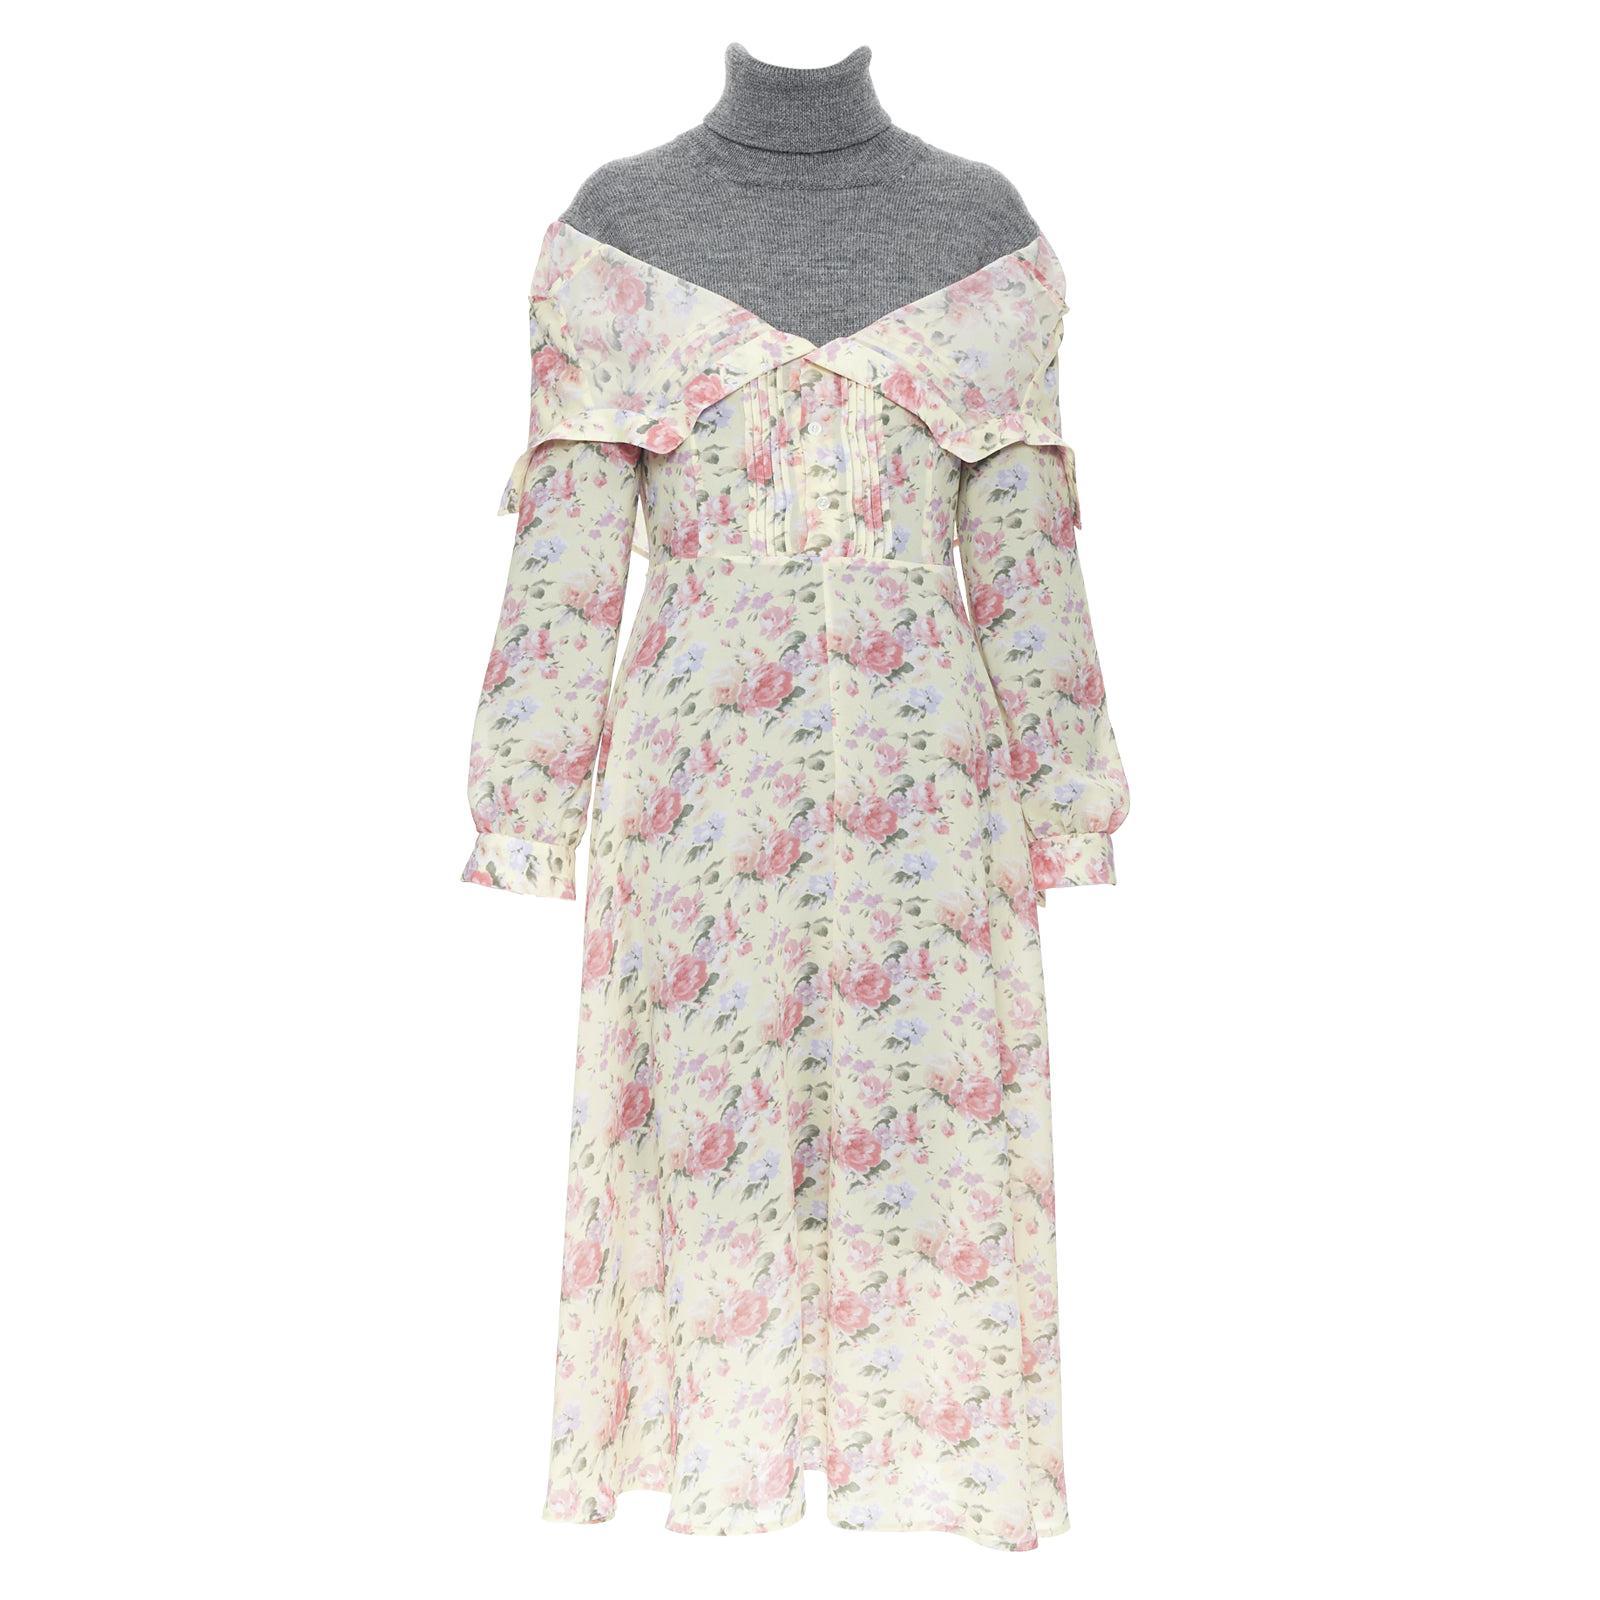 new JUNYA WATANABE CDG AW18 Runway grey wool turtleneck yellow floral dress S